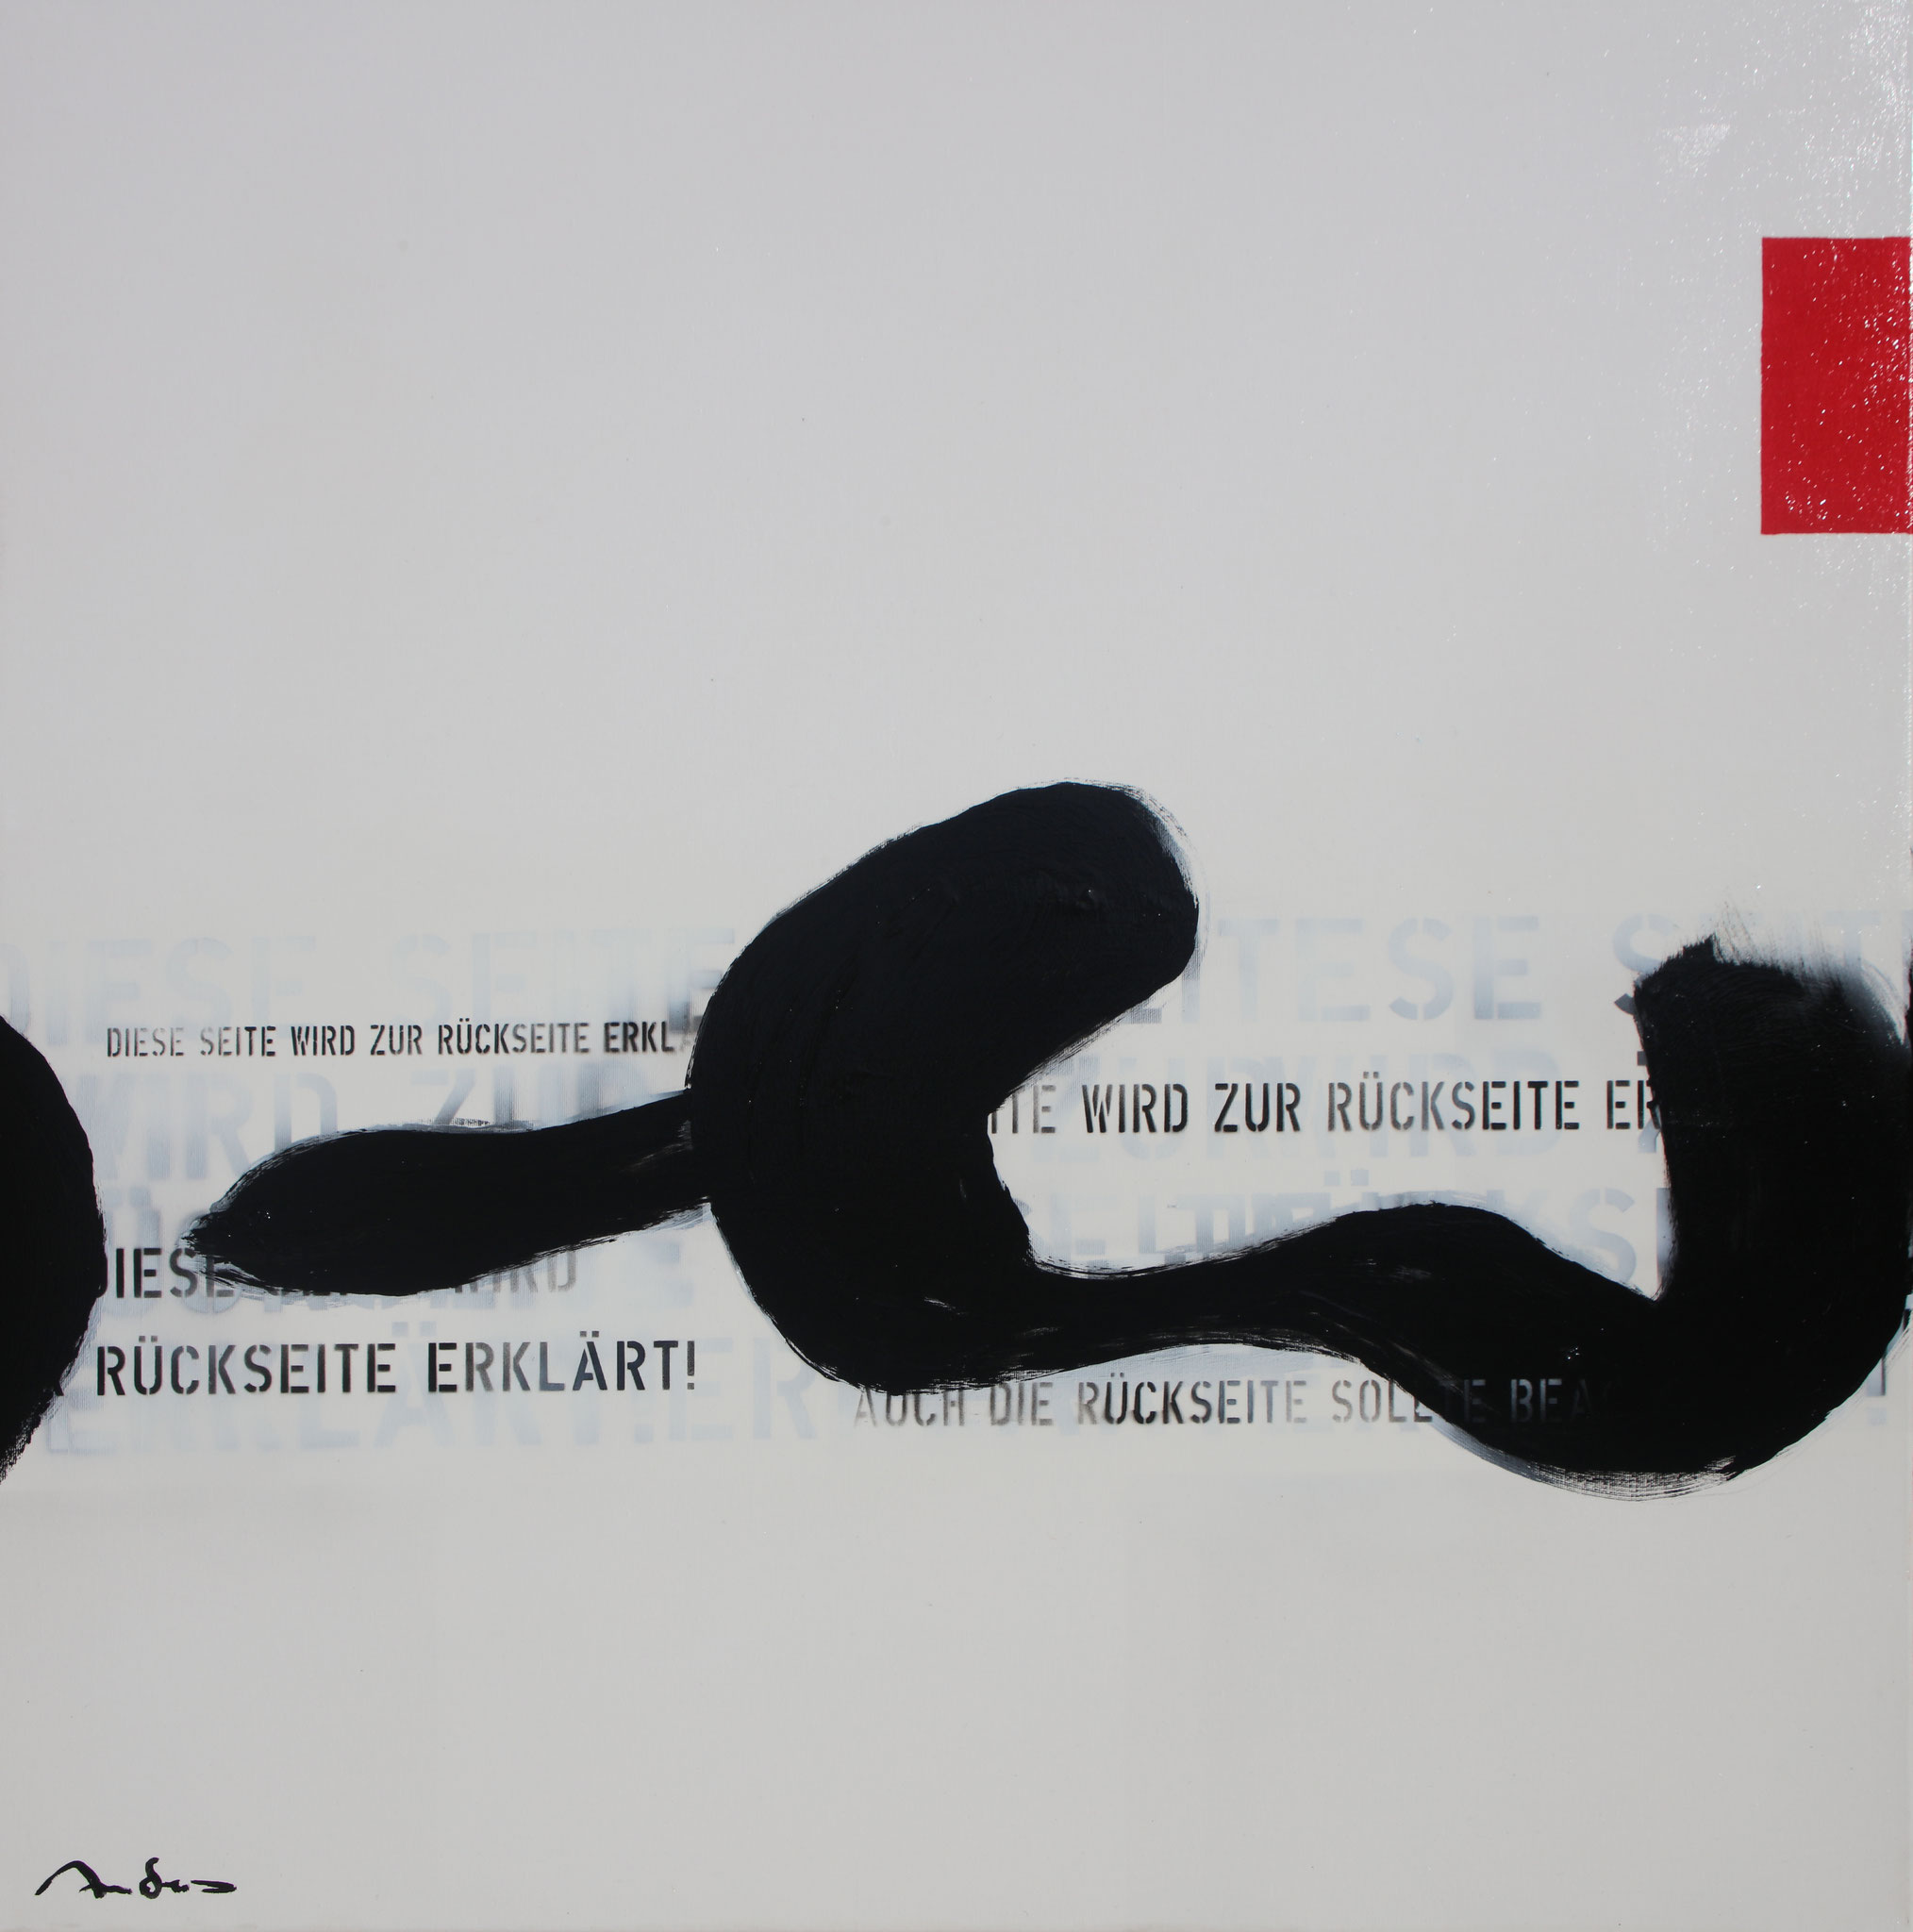 Heureka II - Rückseite - Acryl-Mischtechnik auf Leinwand - 100 x 100 cm